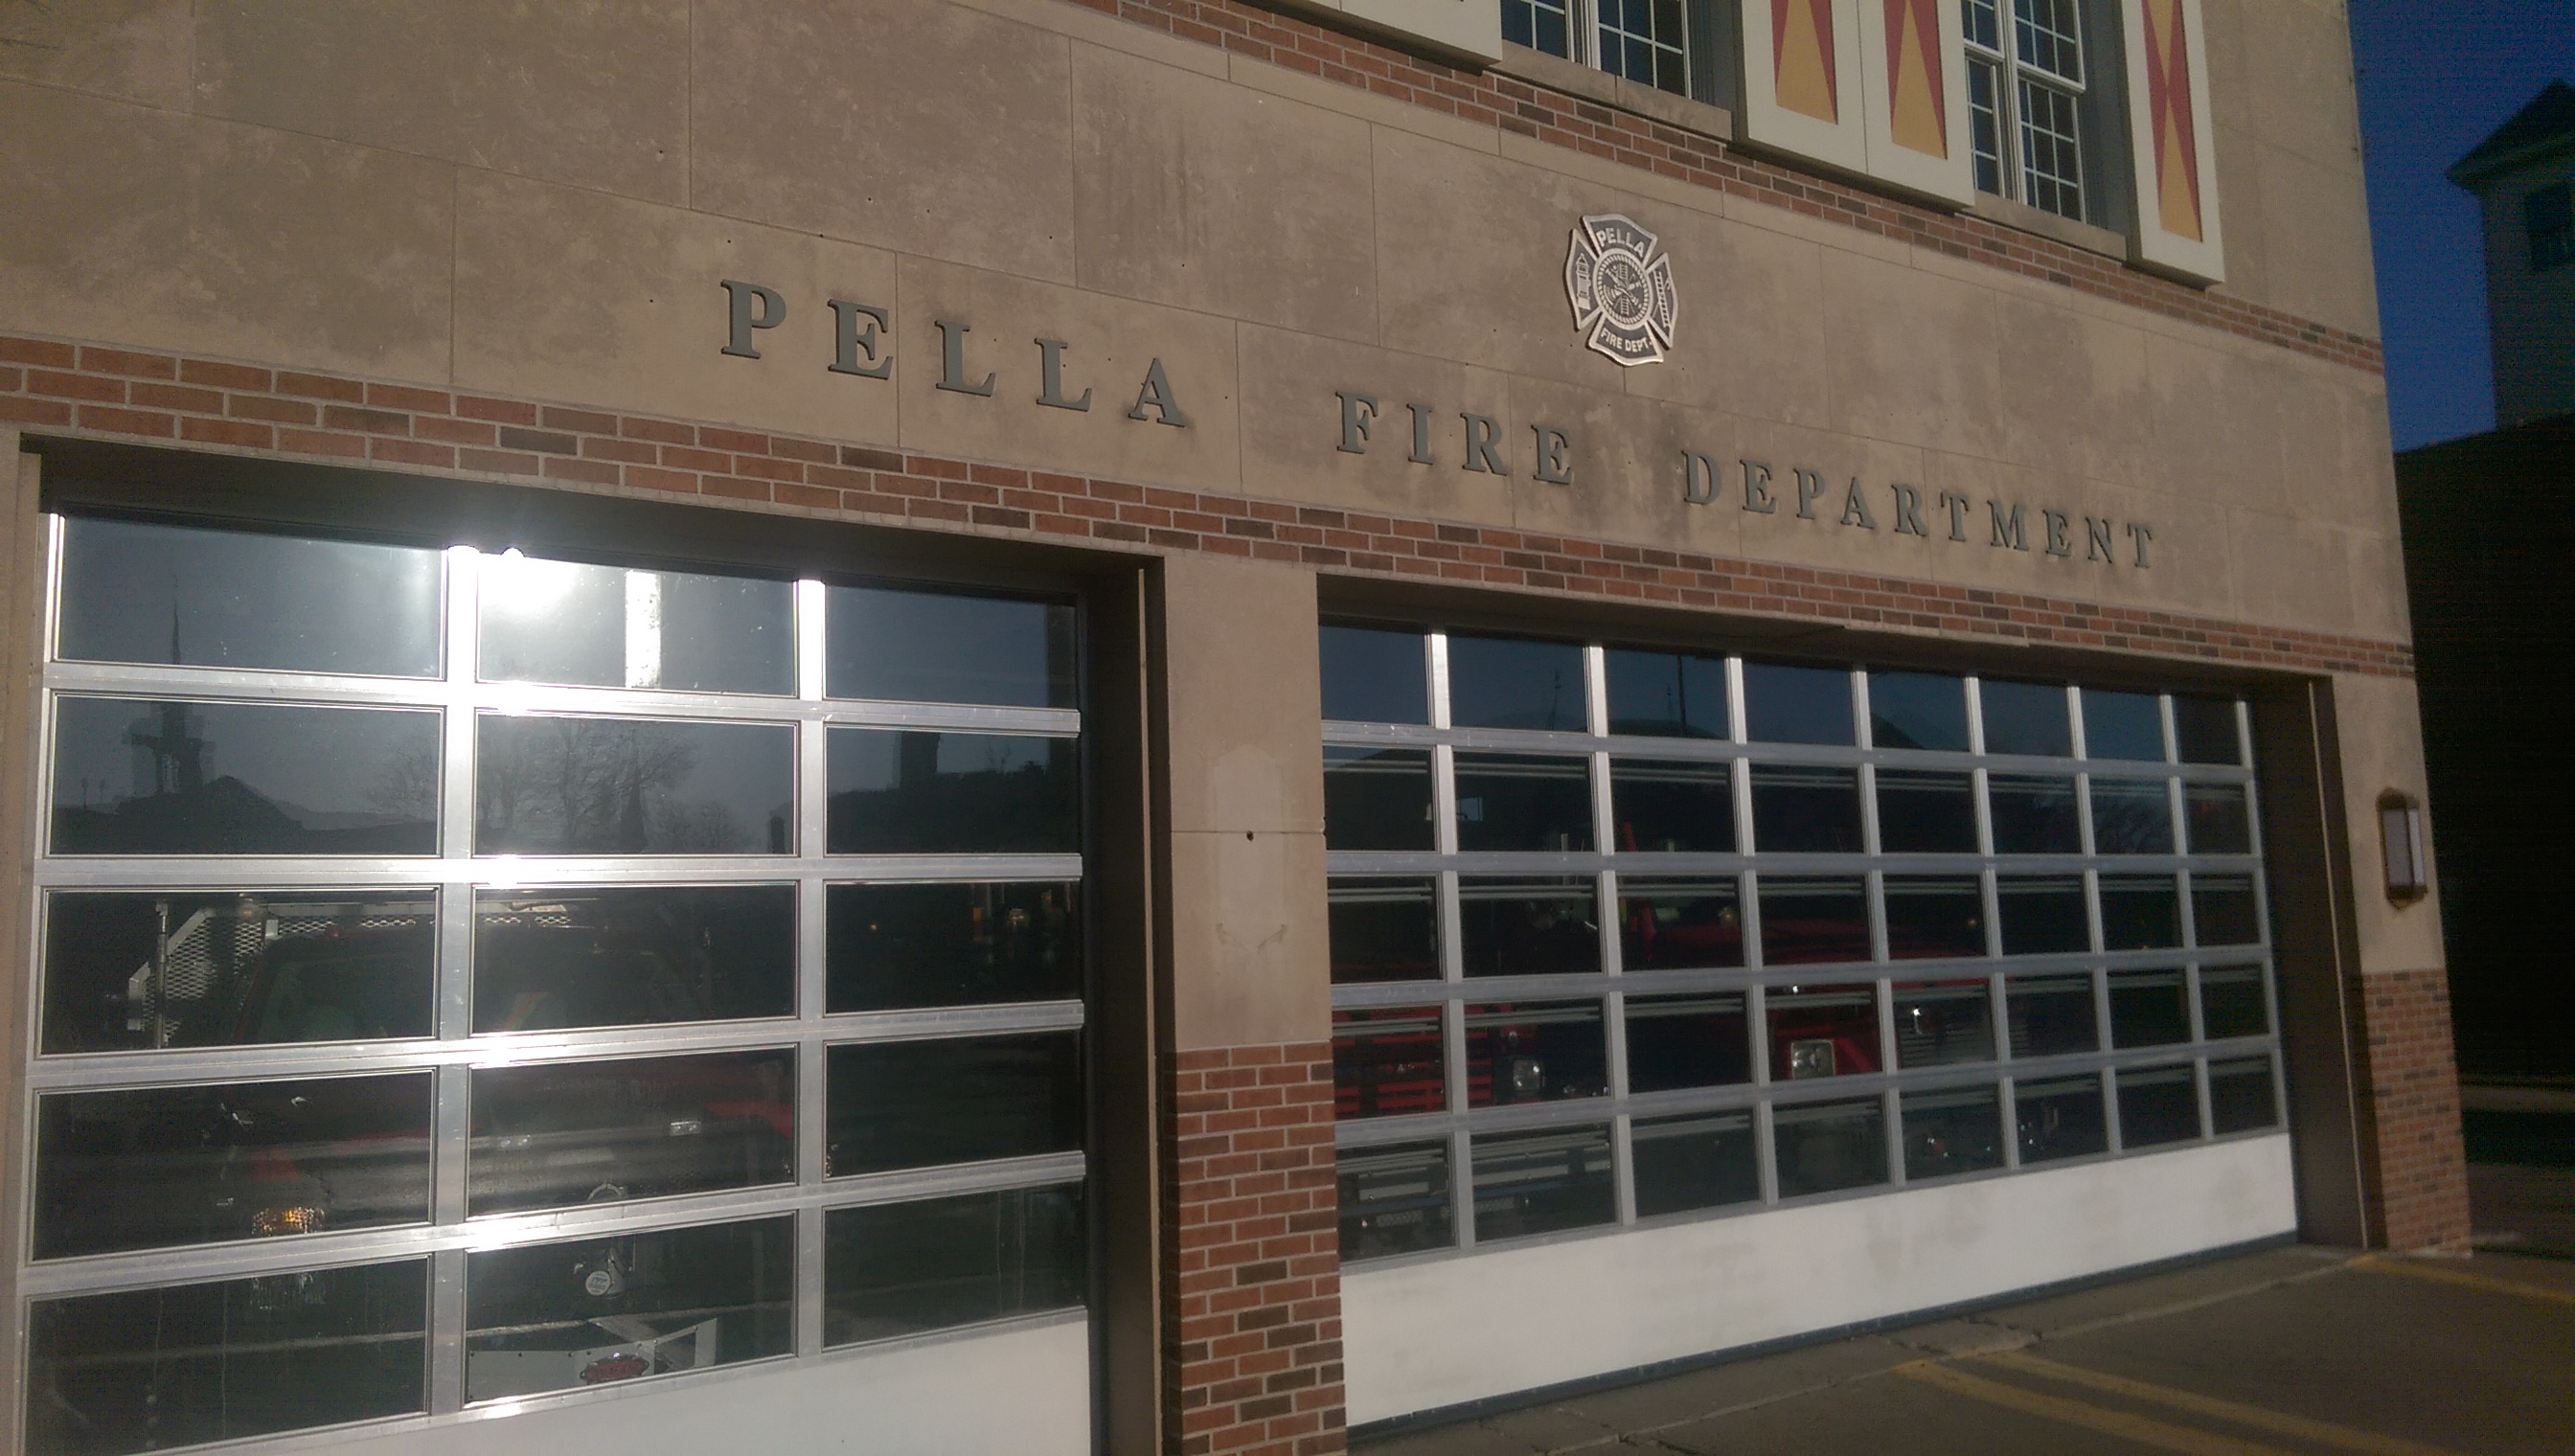 Pella Fire Department